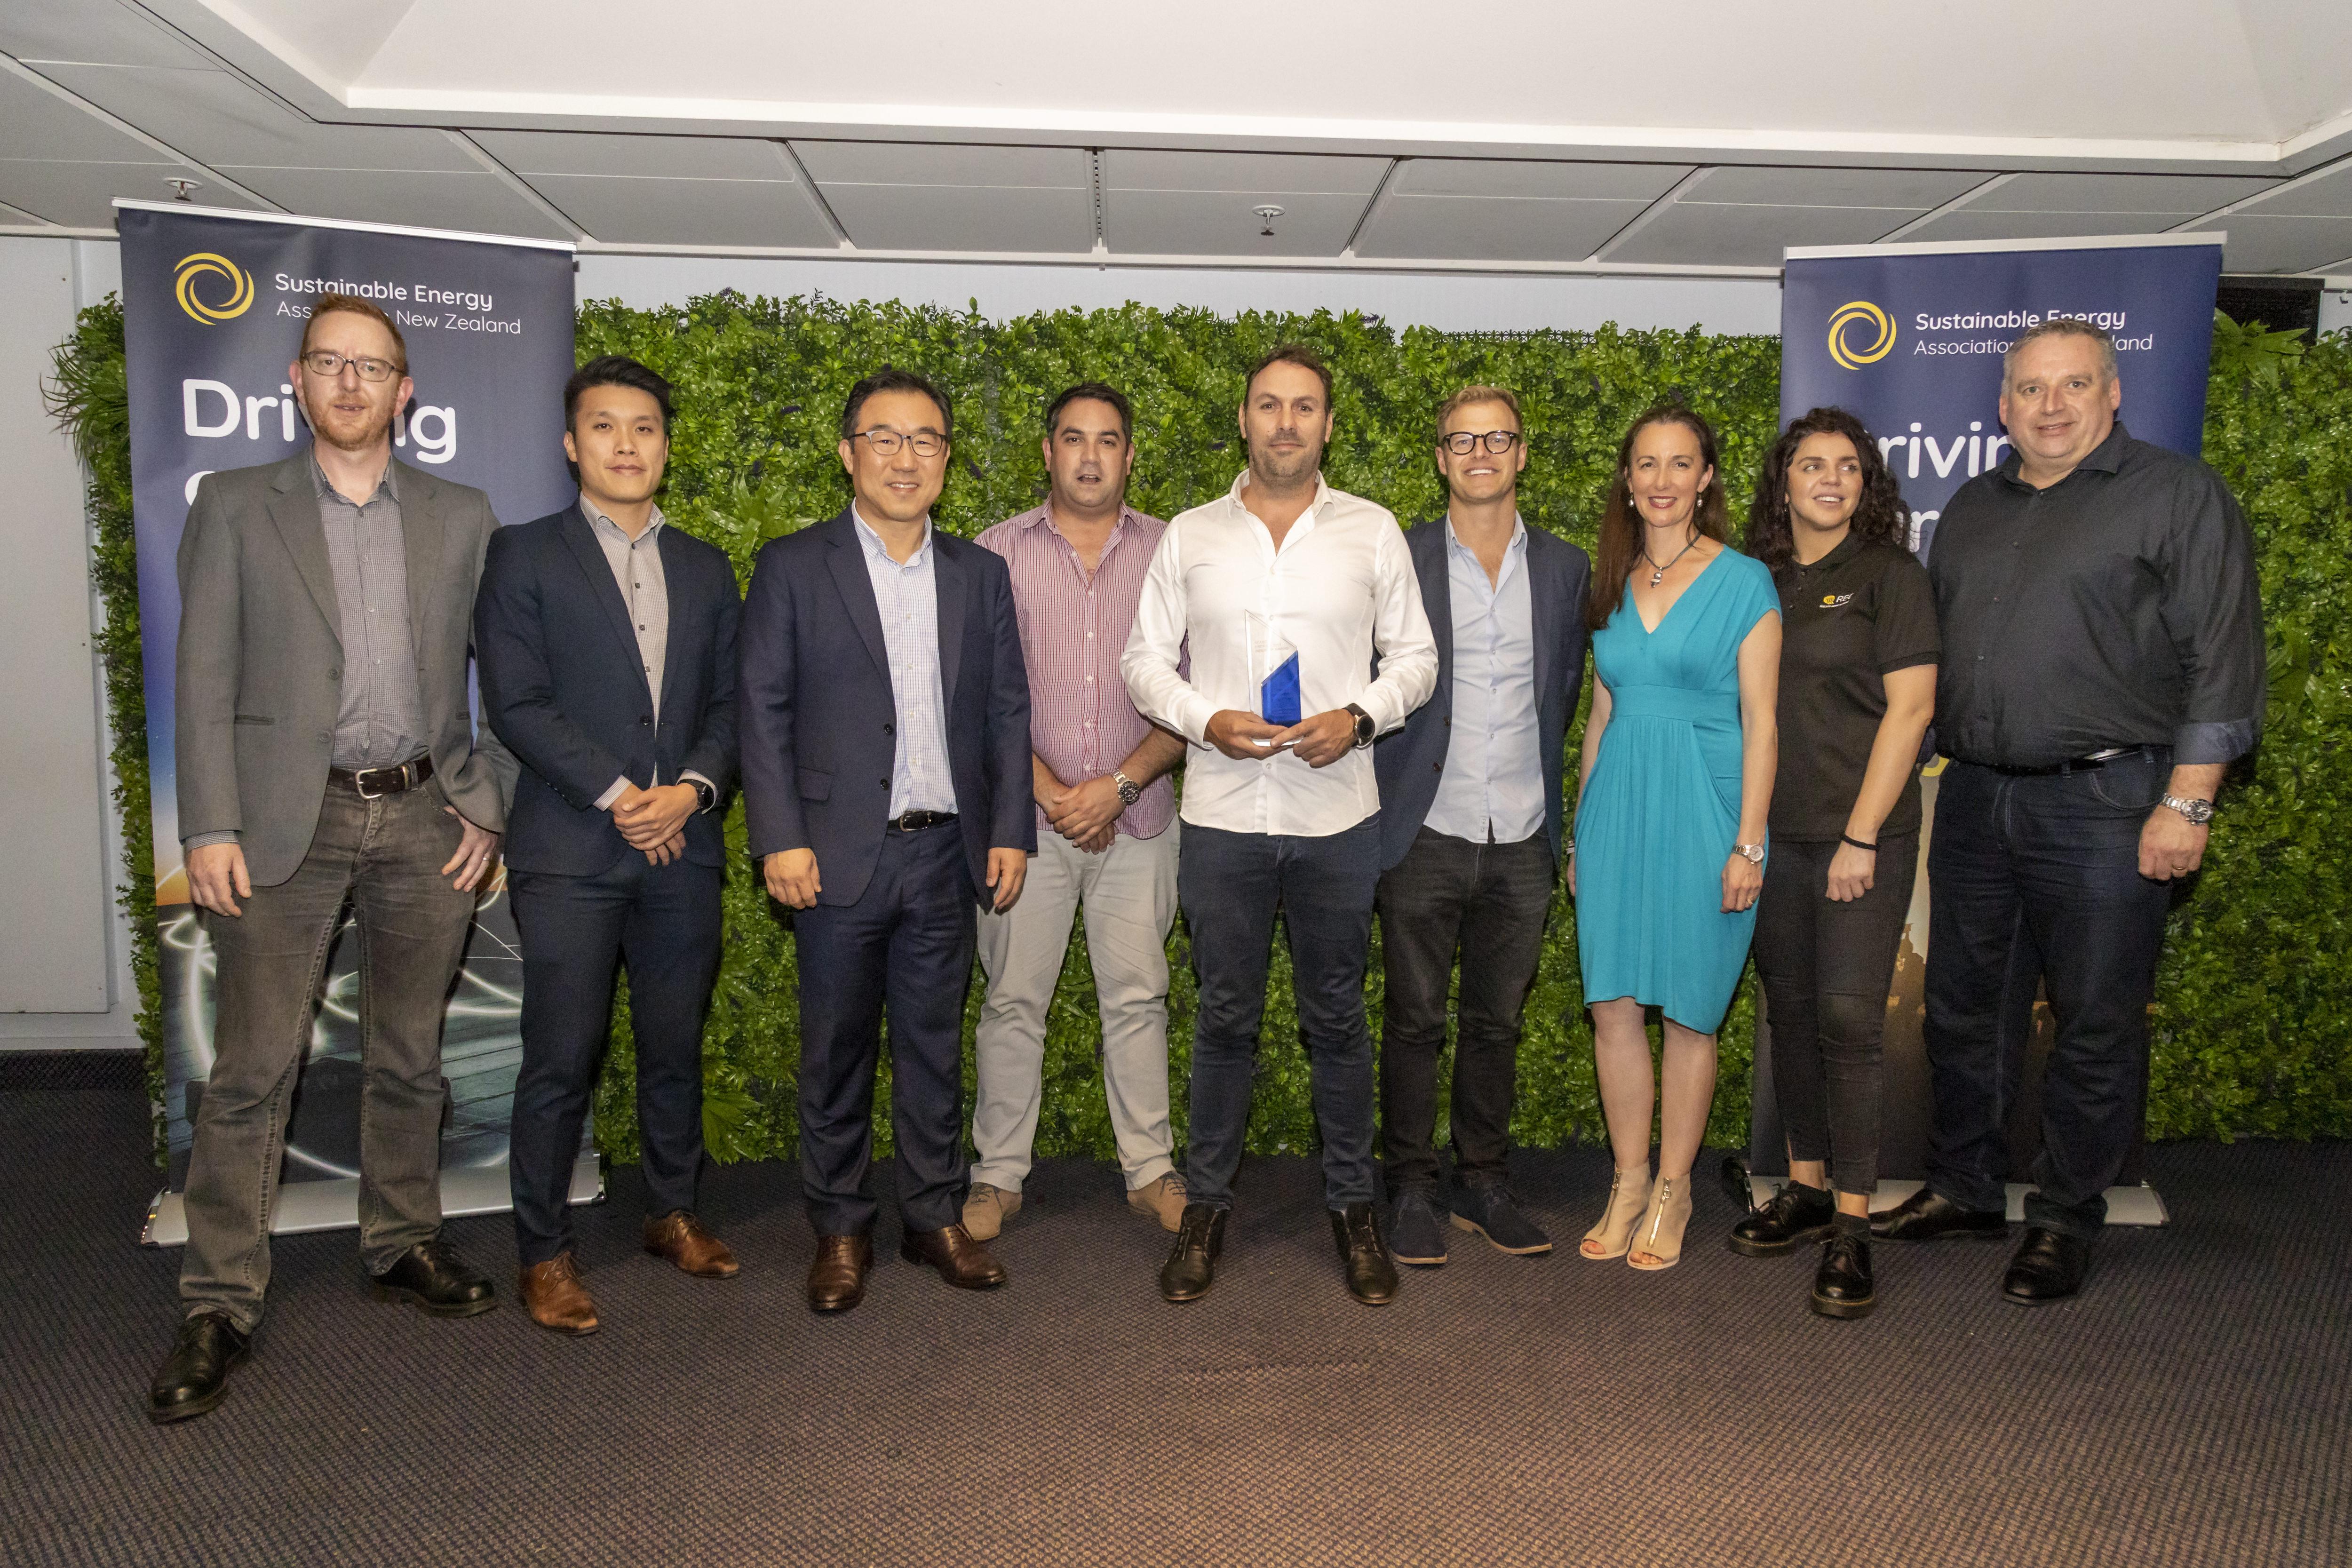 Superpower Technoloies team with Taspac, Trina Solar, REC, Fronius and SEANZ Representatives